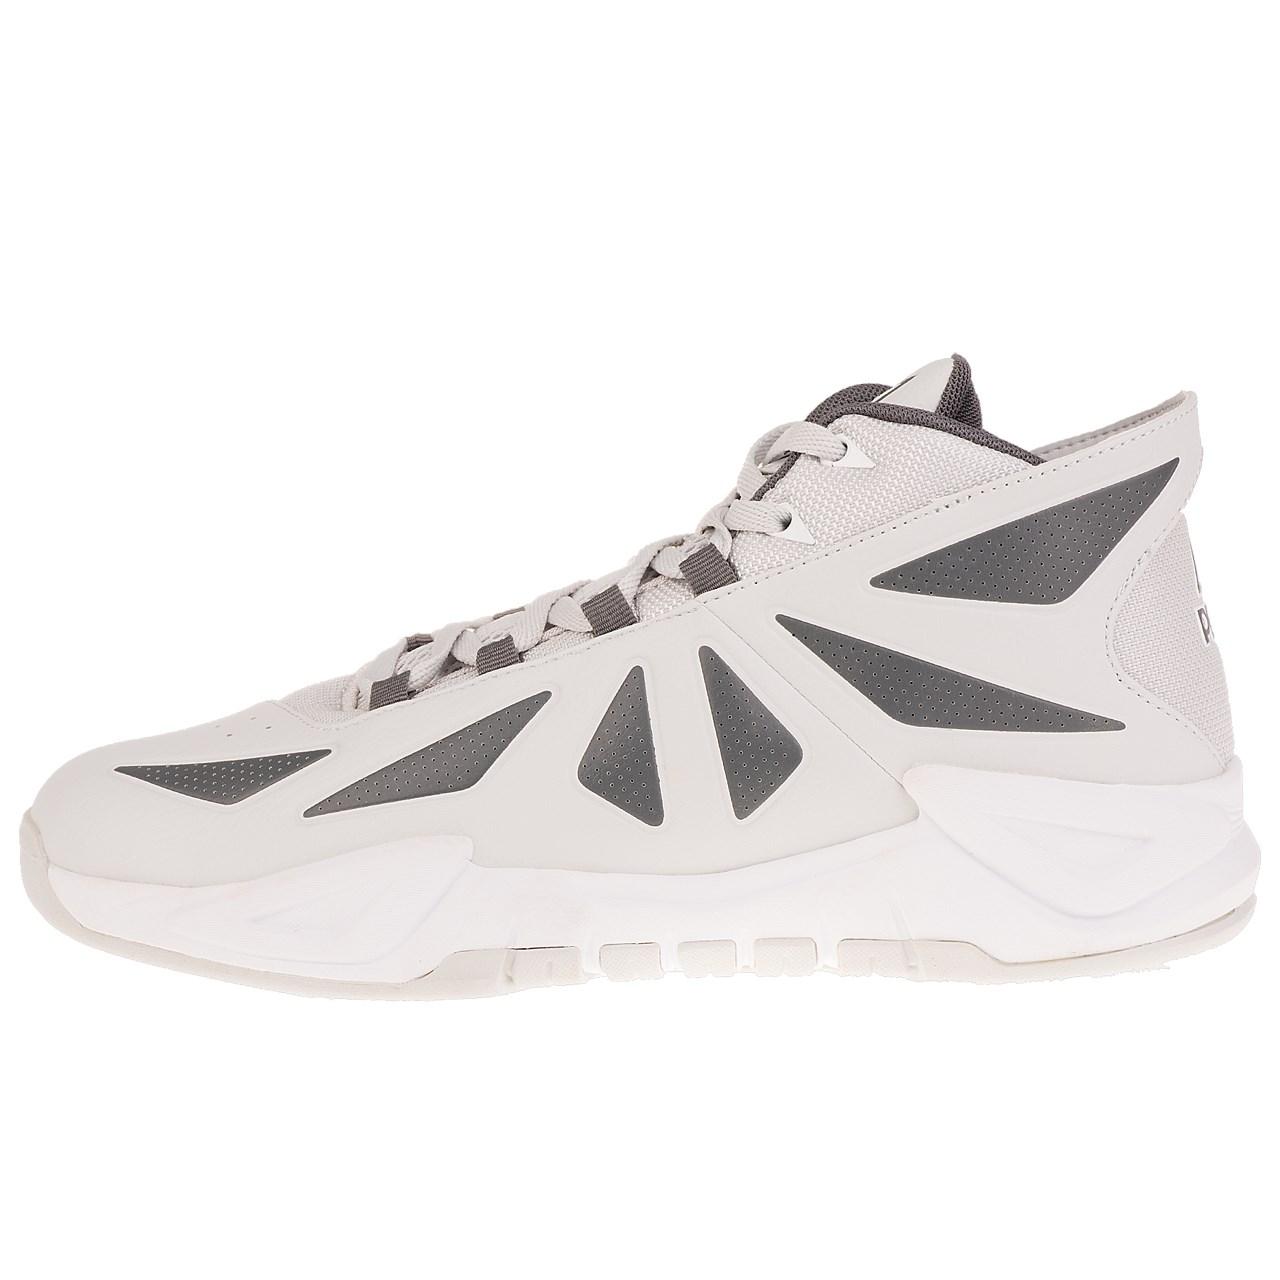 قیمت کفش بسکتبال مردانه پیک مدل E52081A